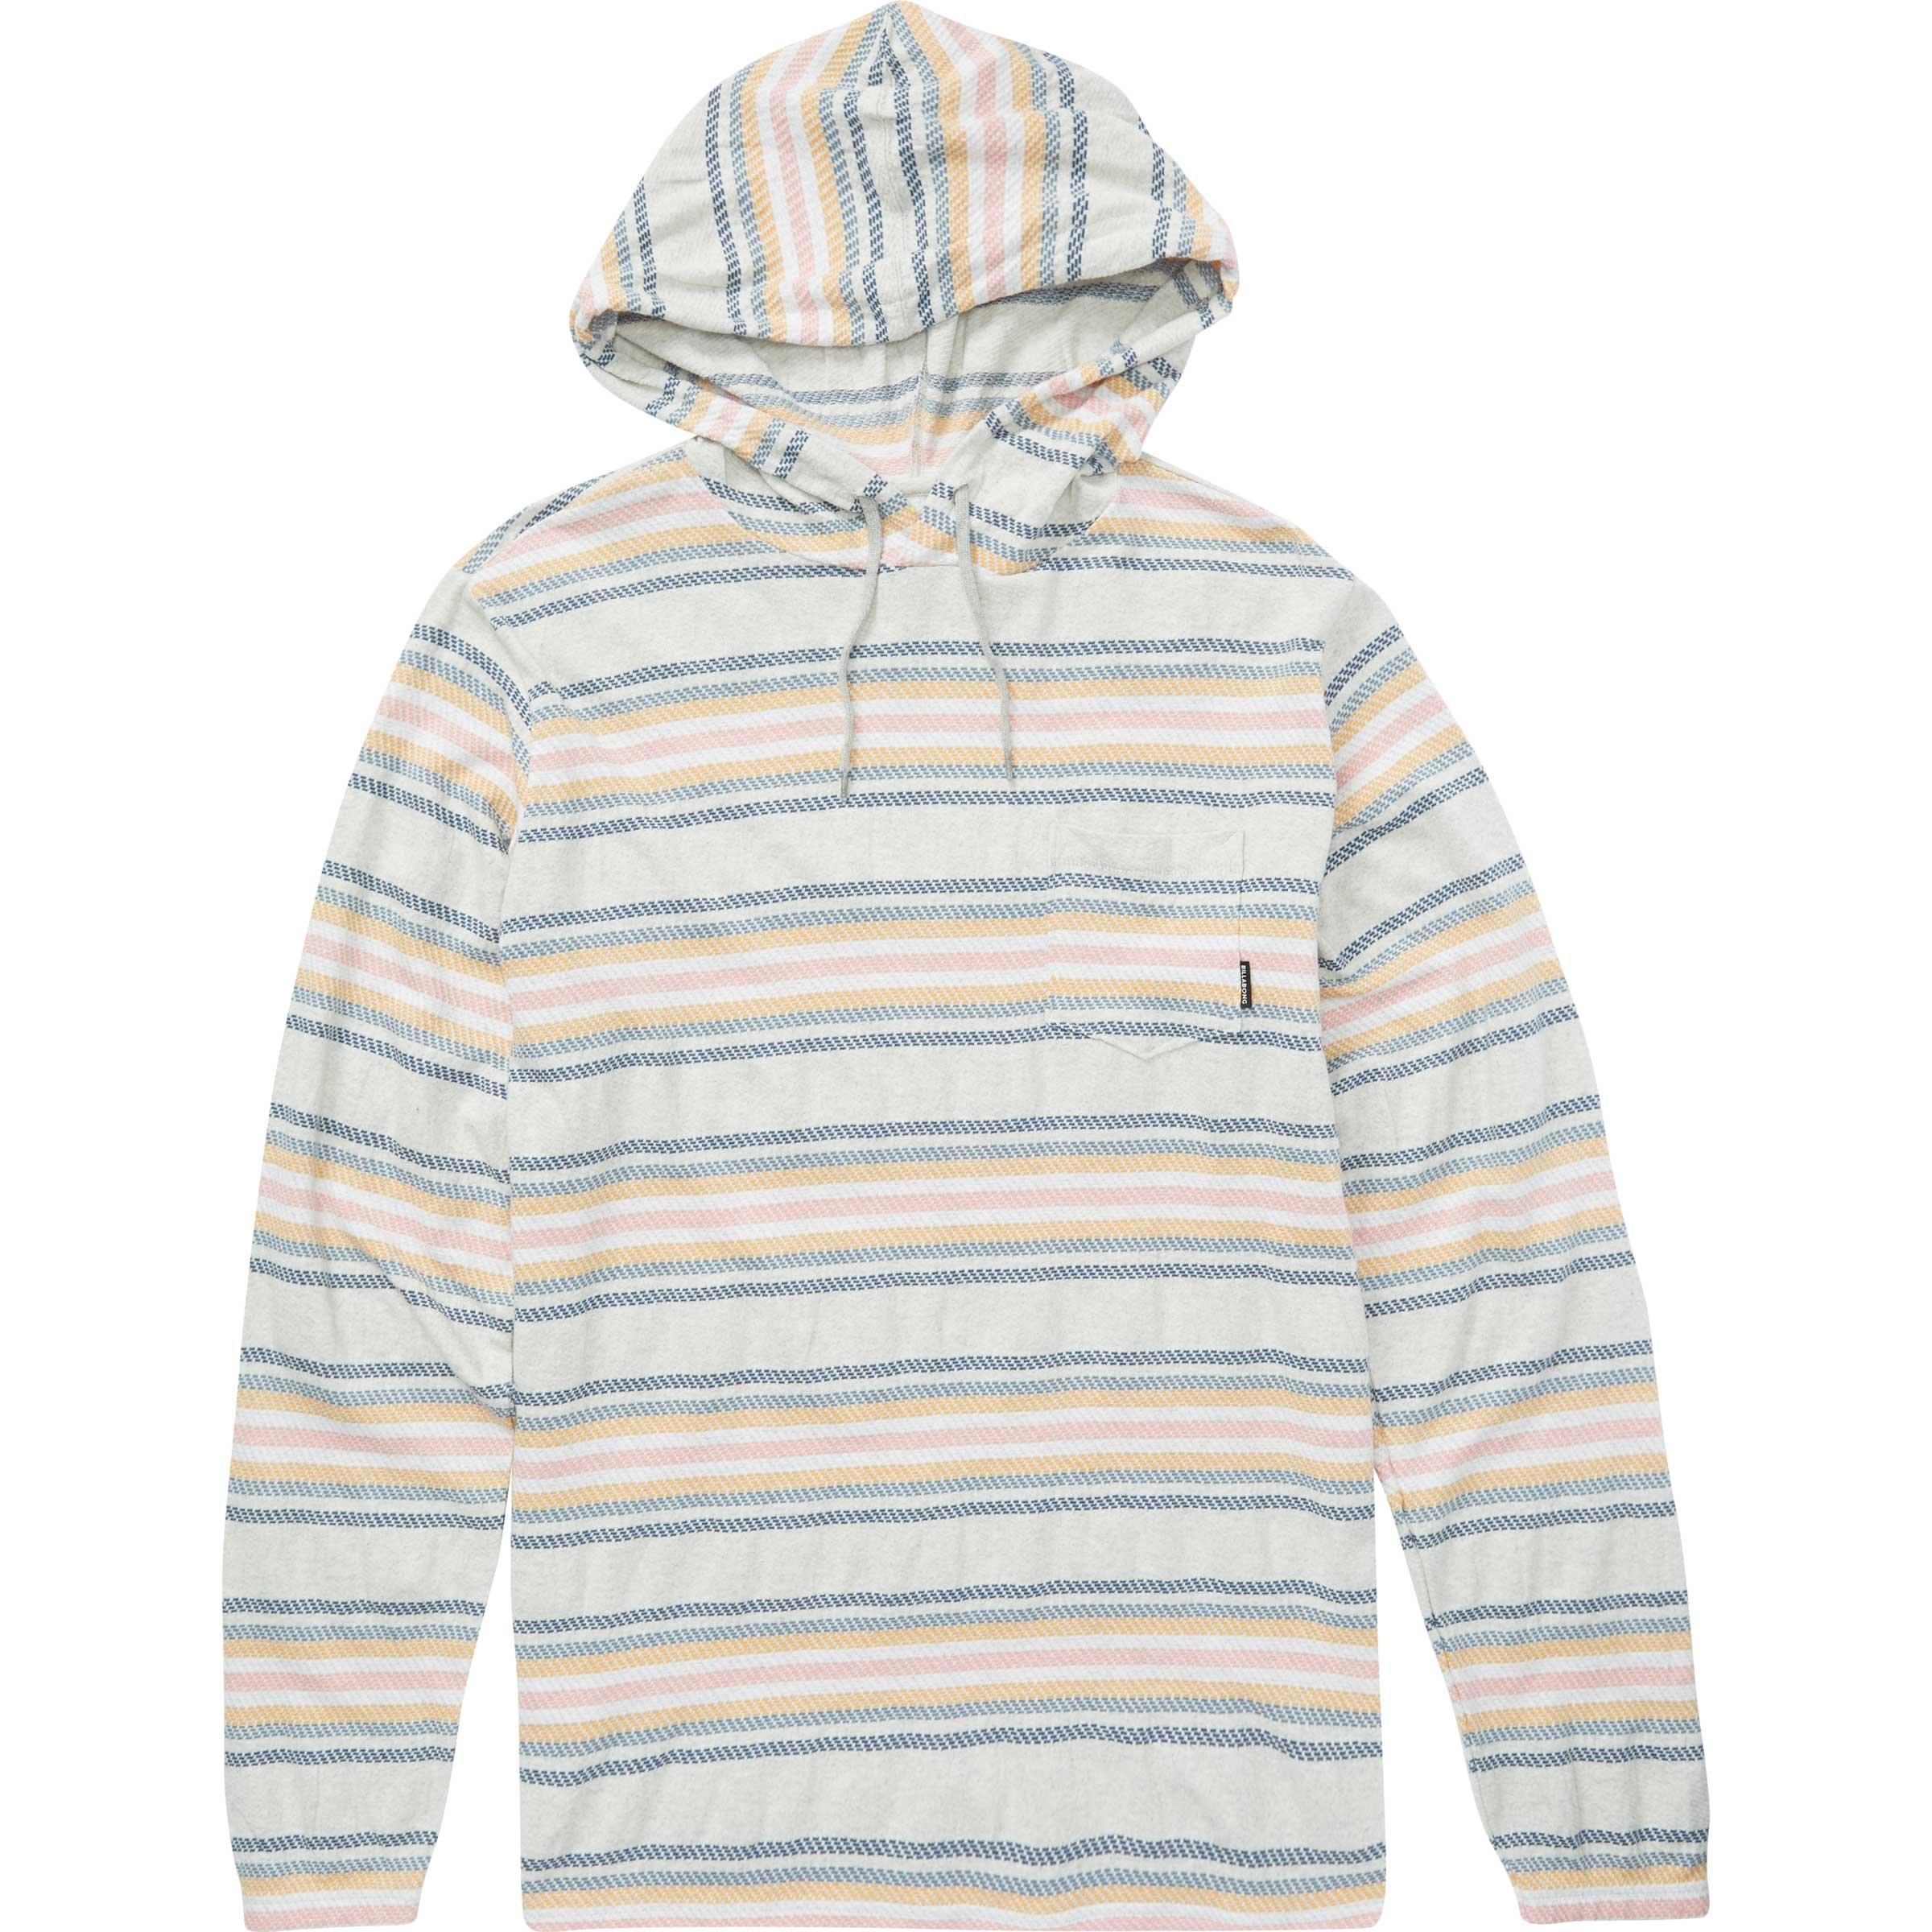 Billabong Men's Flecker Baja Pullover Hoody, Light Grey Heather, M